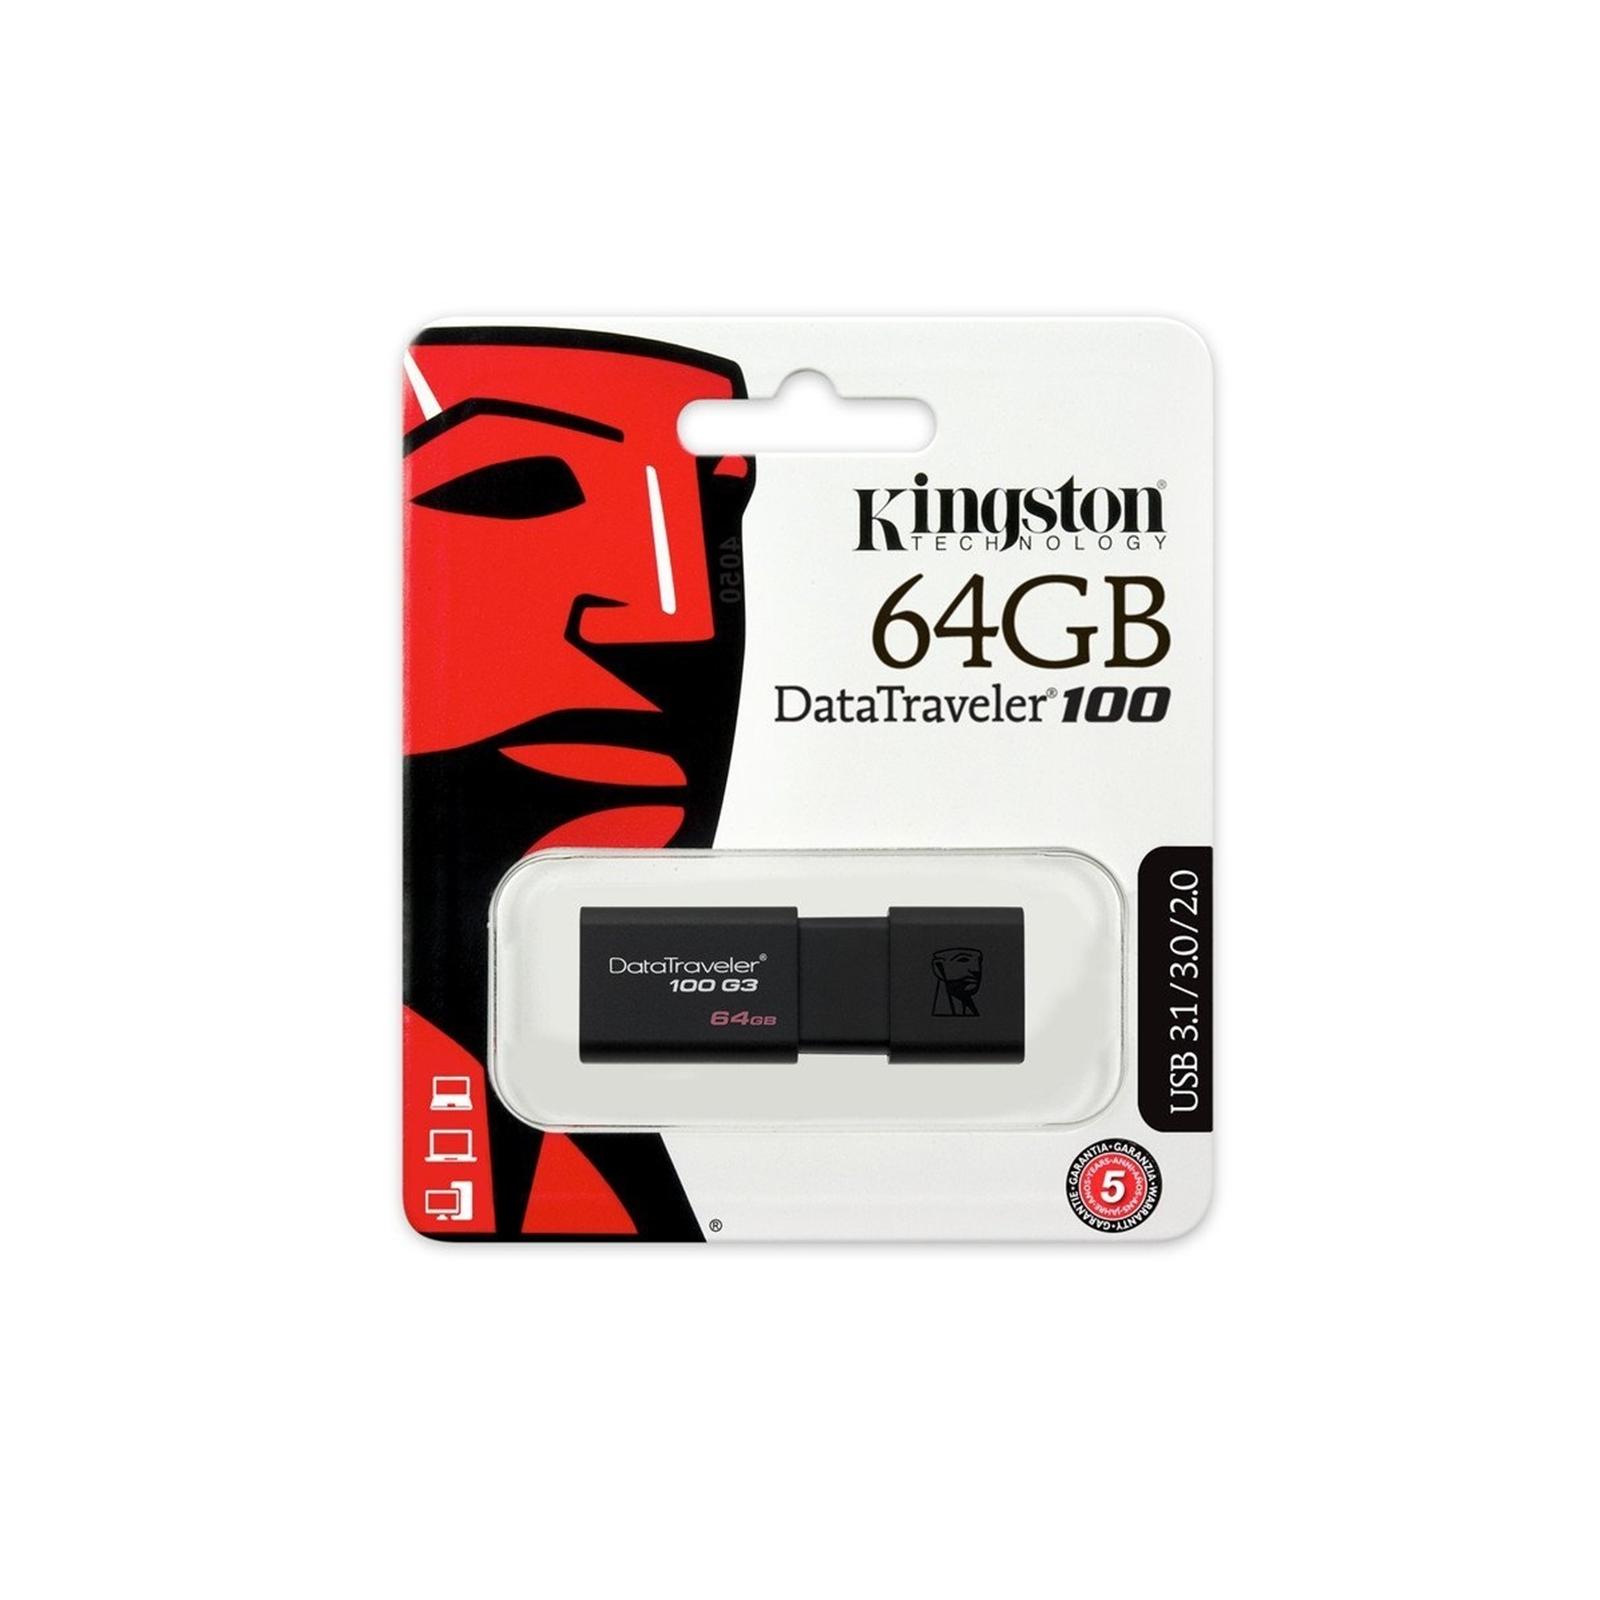 Kingston DataTraveler 100 64GB USB 3.0  USB Drive